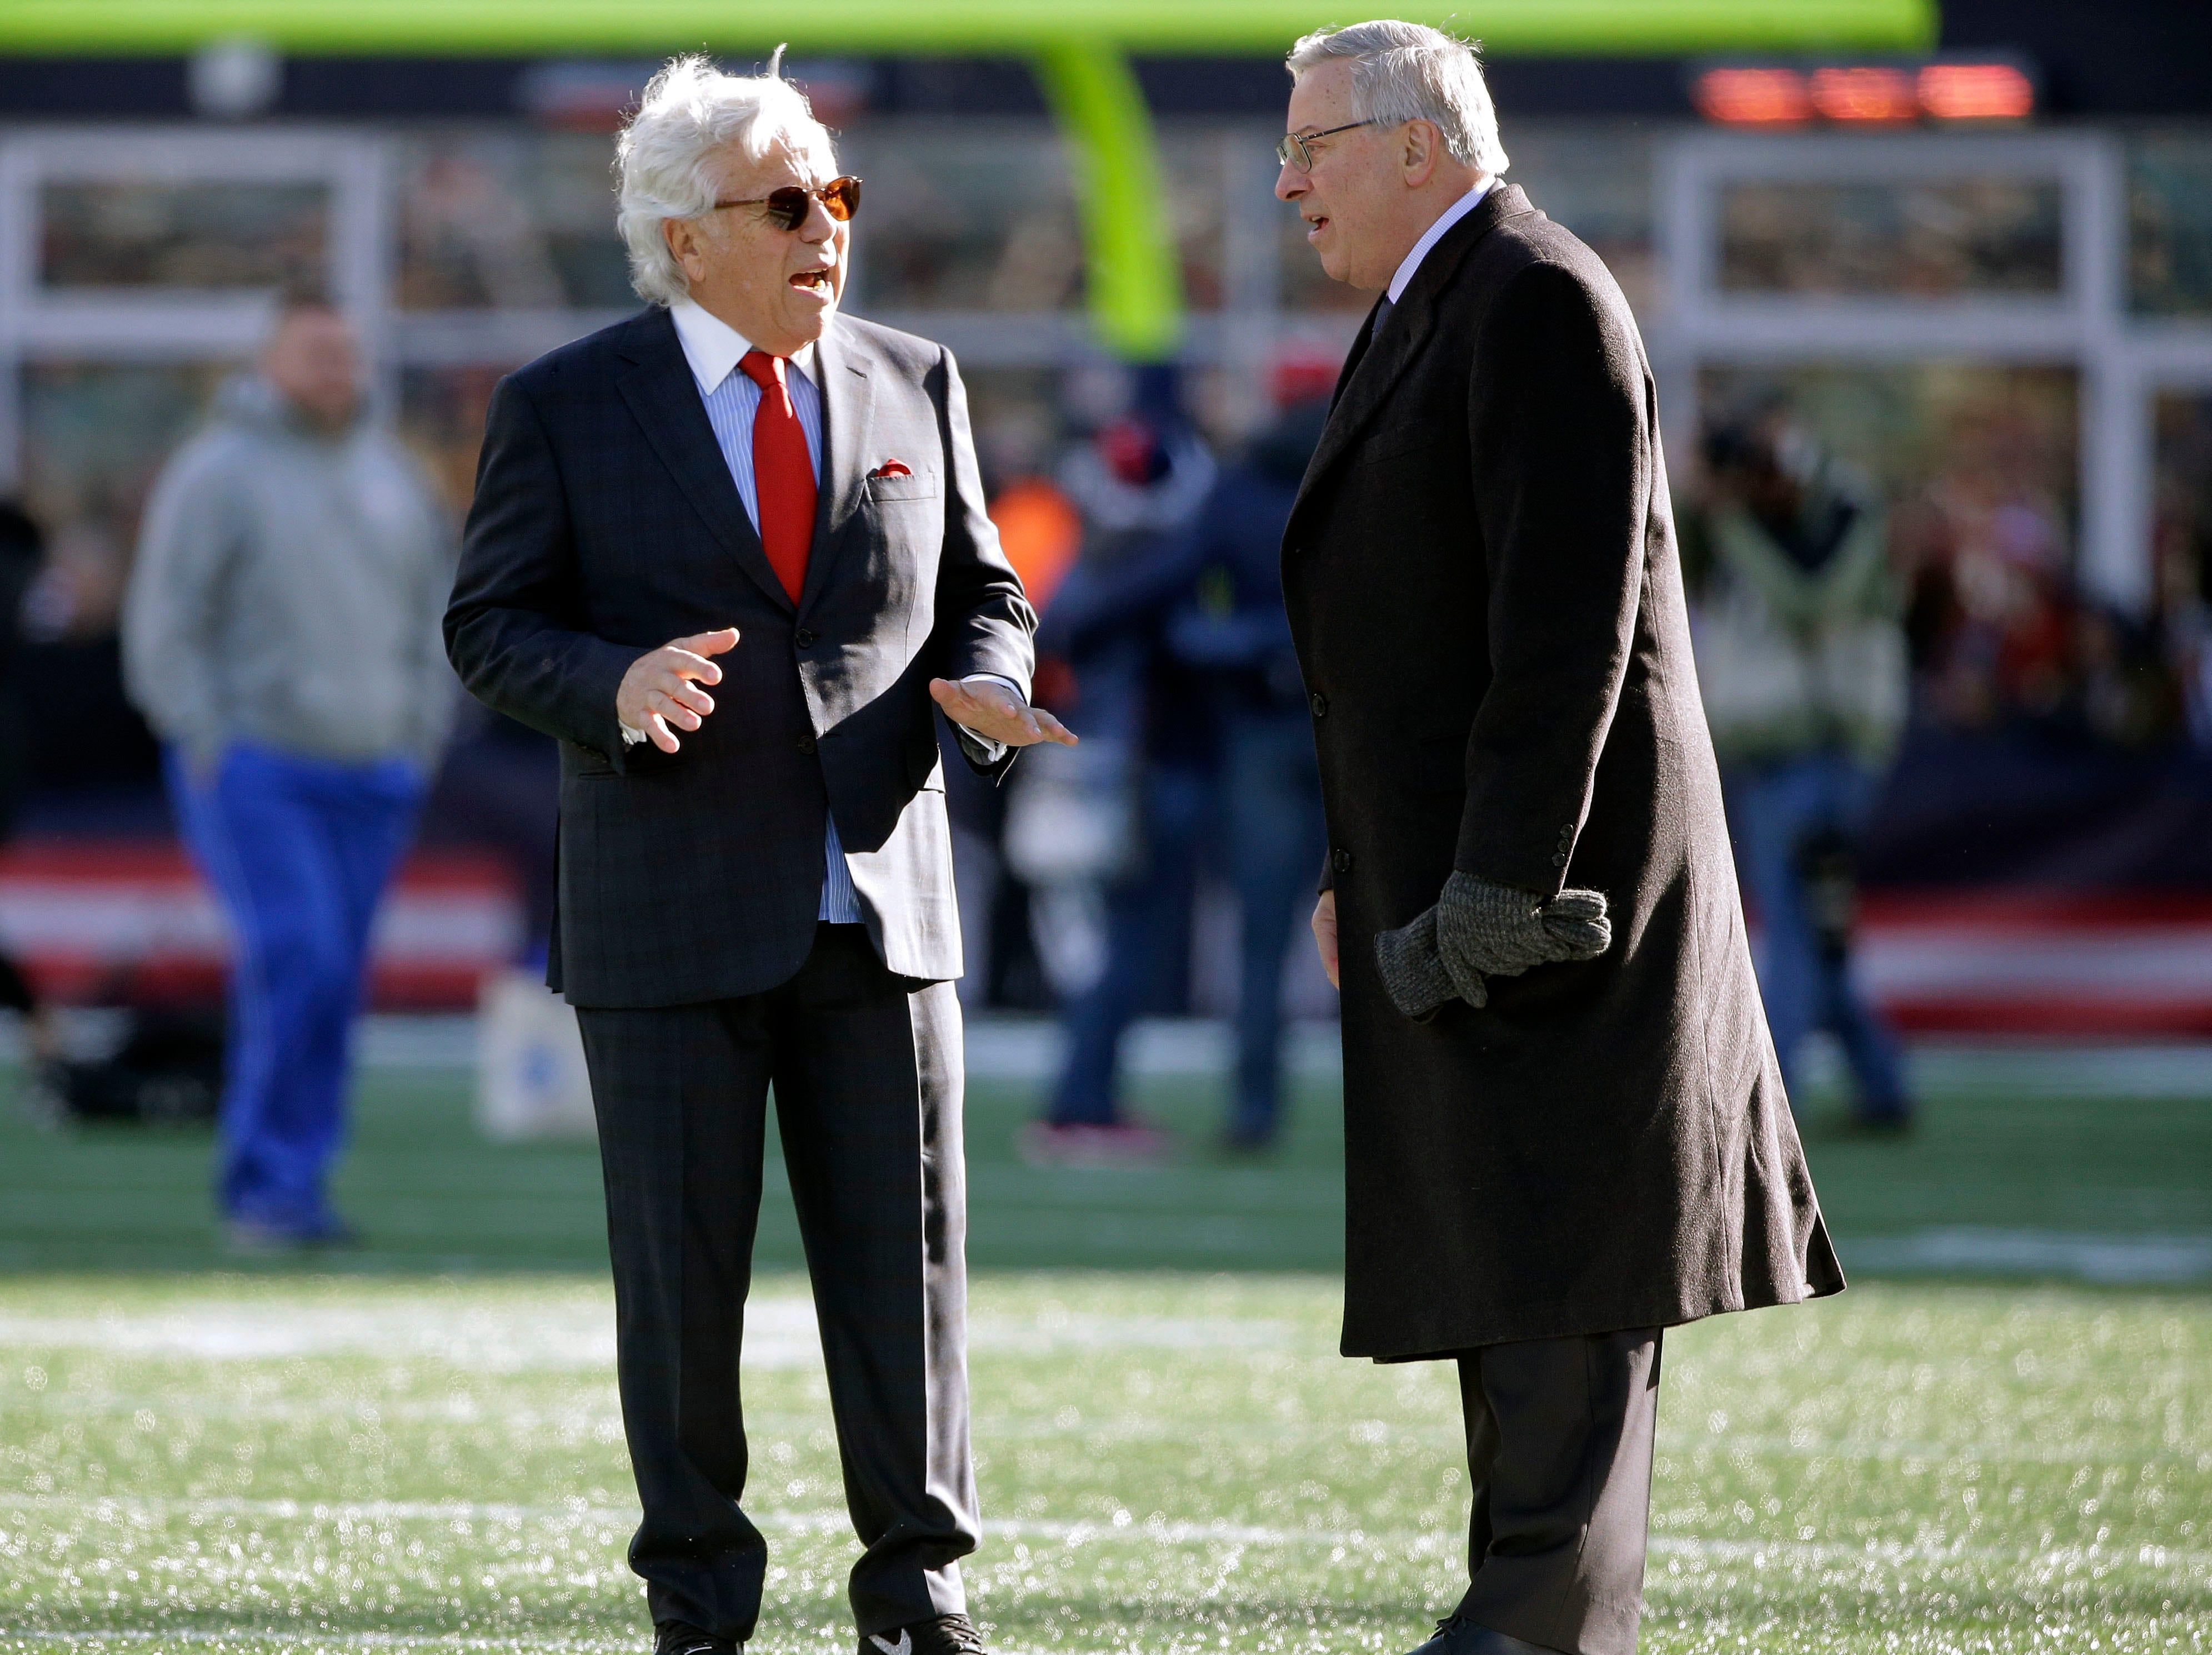 New England Patriots owner Robert Kraft, left, speaks to Buffalo Bills owner Terry Pegula before an NFL football game, Sunday, Dec. 23, 2018, in Foxborough, Mass. (AP Photo/Steven Senne)